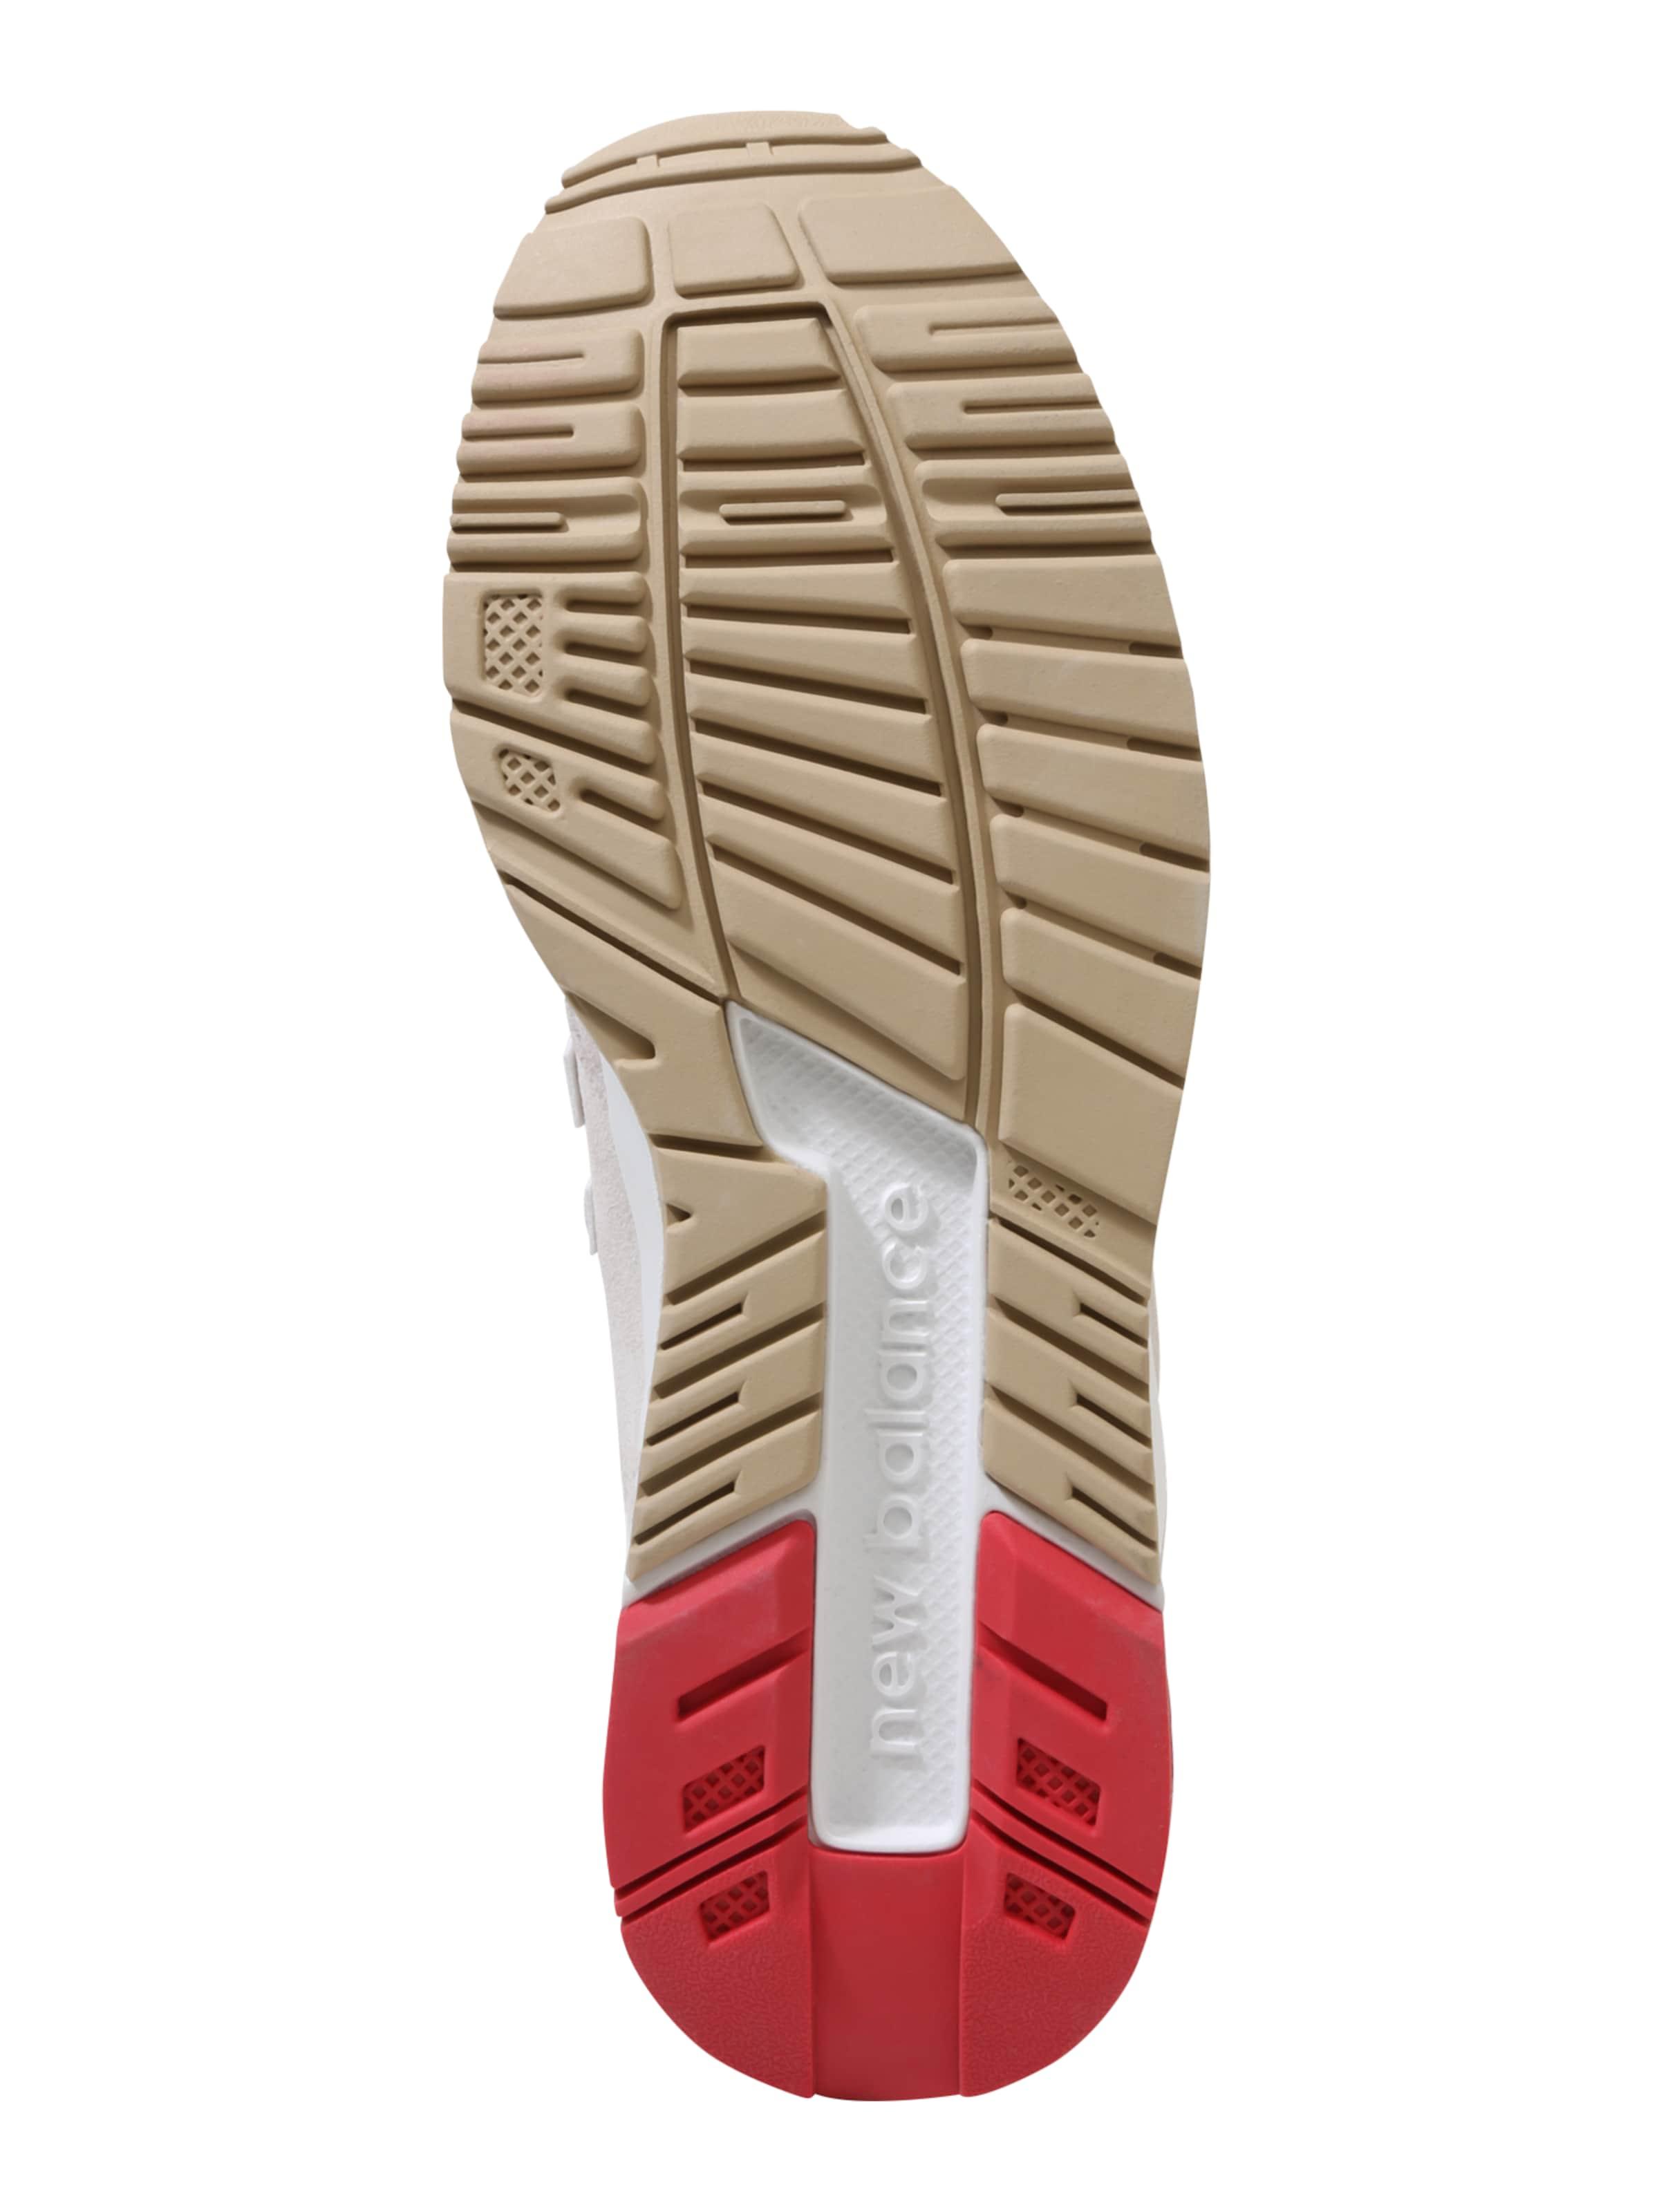 Offwhite New In Rot Sneaker HellblauGrau 'wl840' Balance pqVSUzM